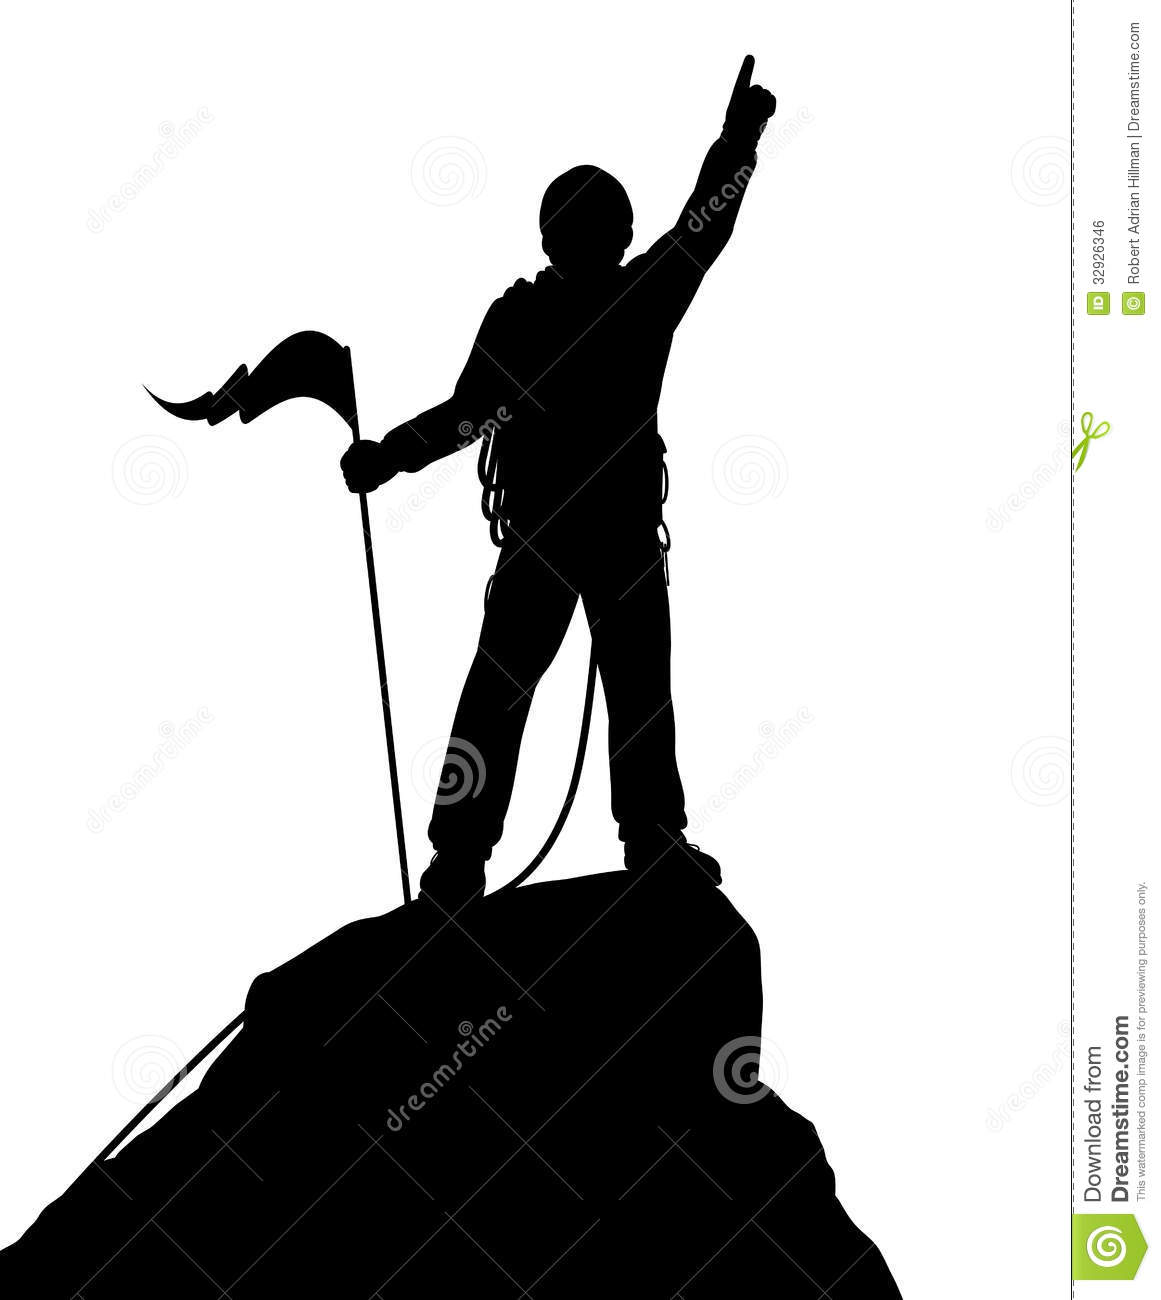 Free clipart mountain climber stock Mountain Climbing Clipart | Free download best Mountain Climbing ... stock